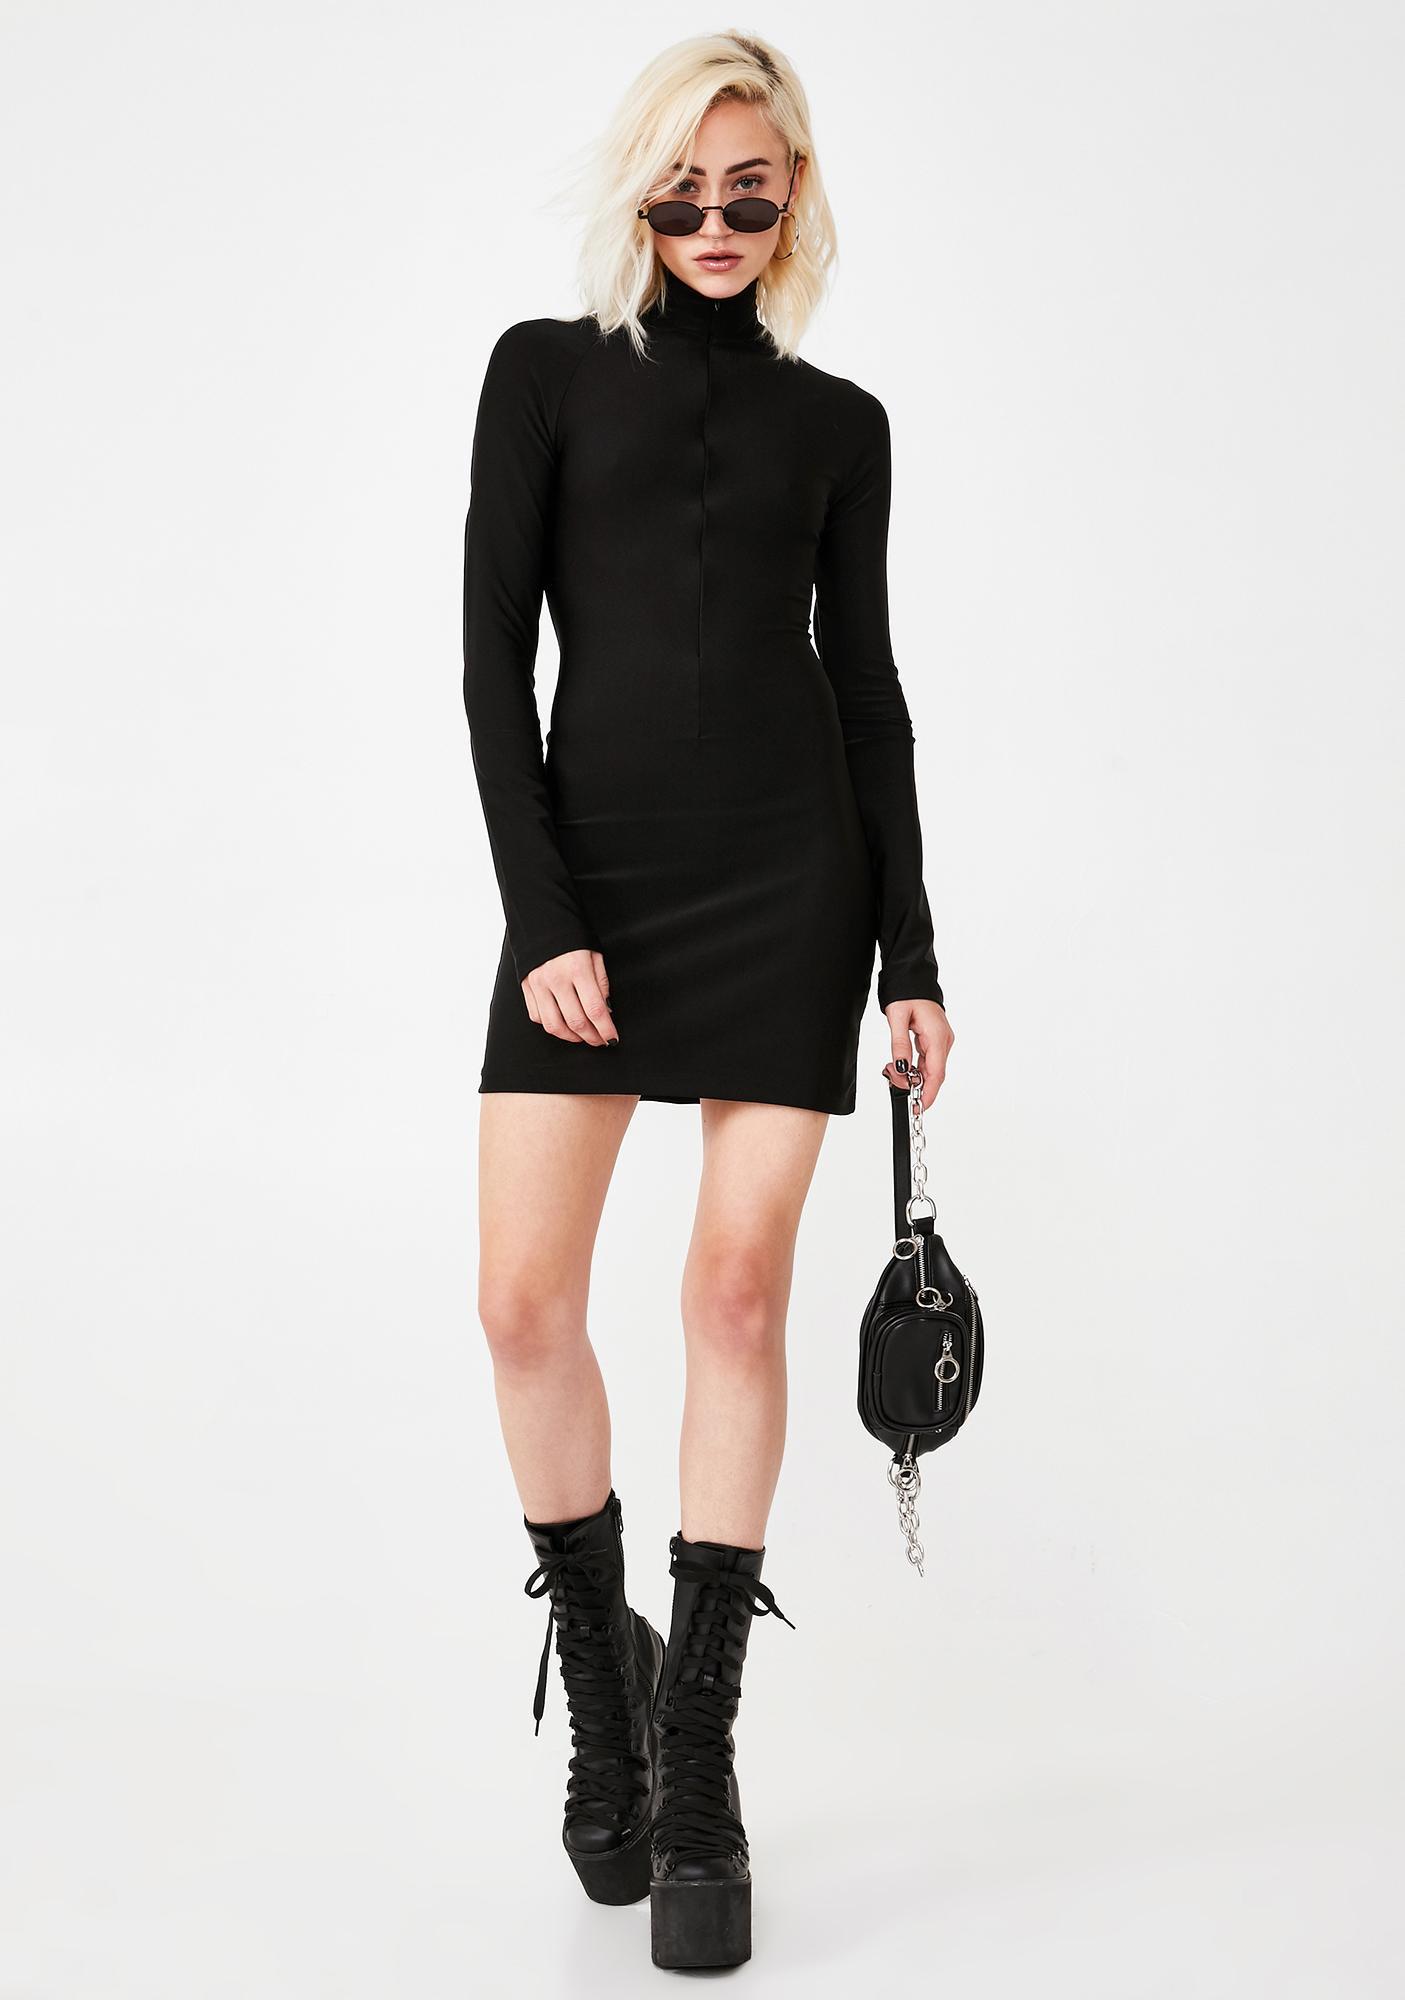 Kiki Riki Control Freak Mini Dress